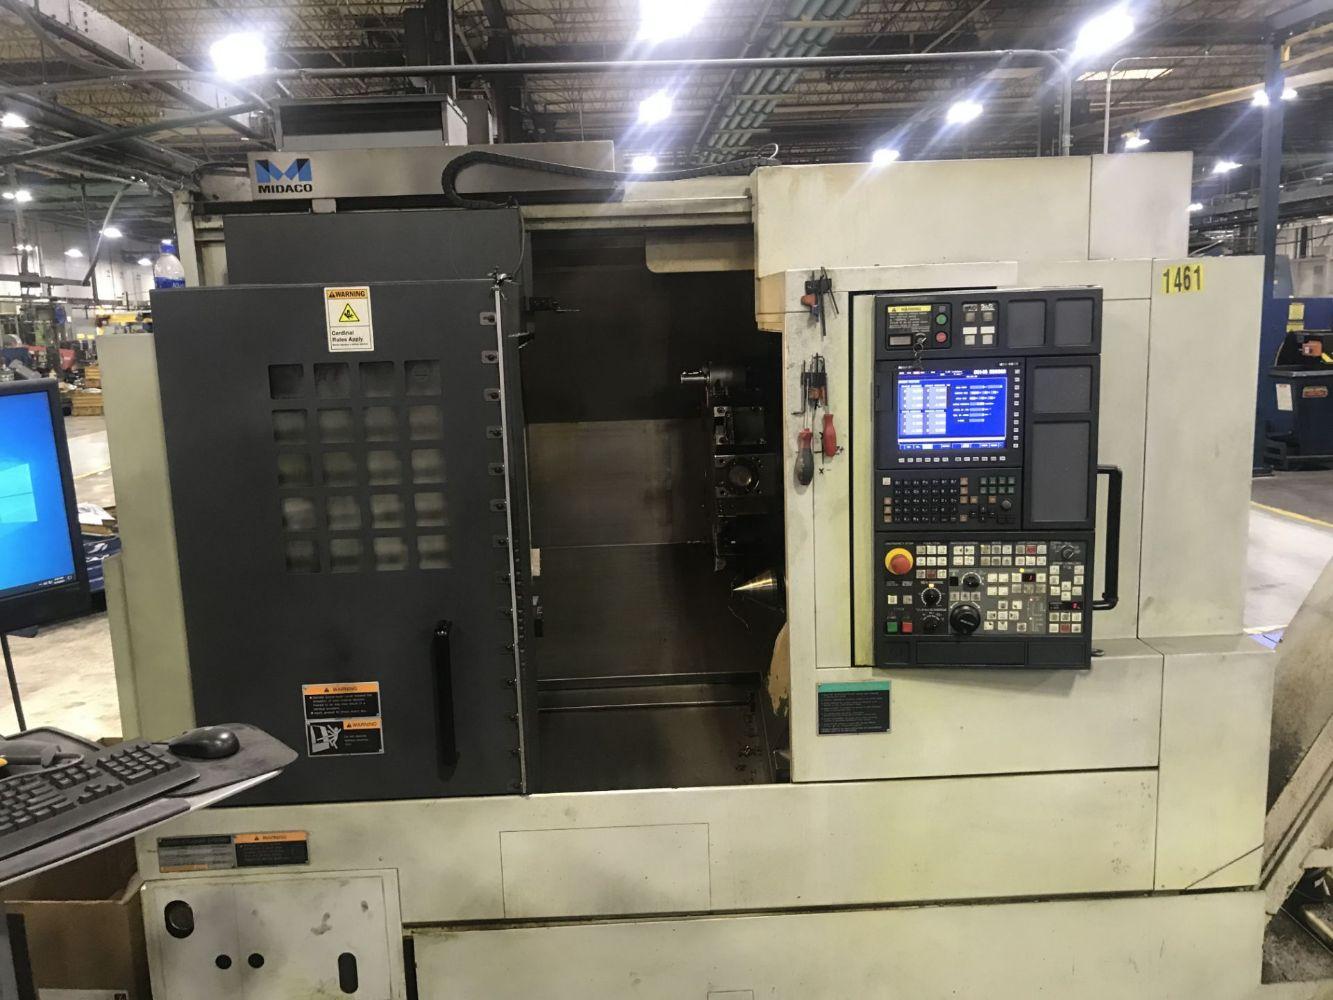 Surplus Machinery - Major Forklift Gear Manufacturer